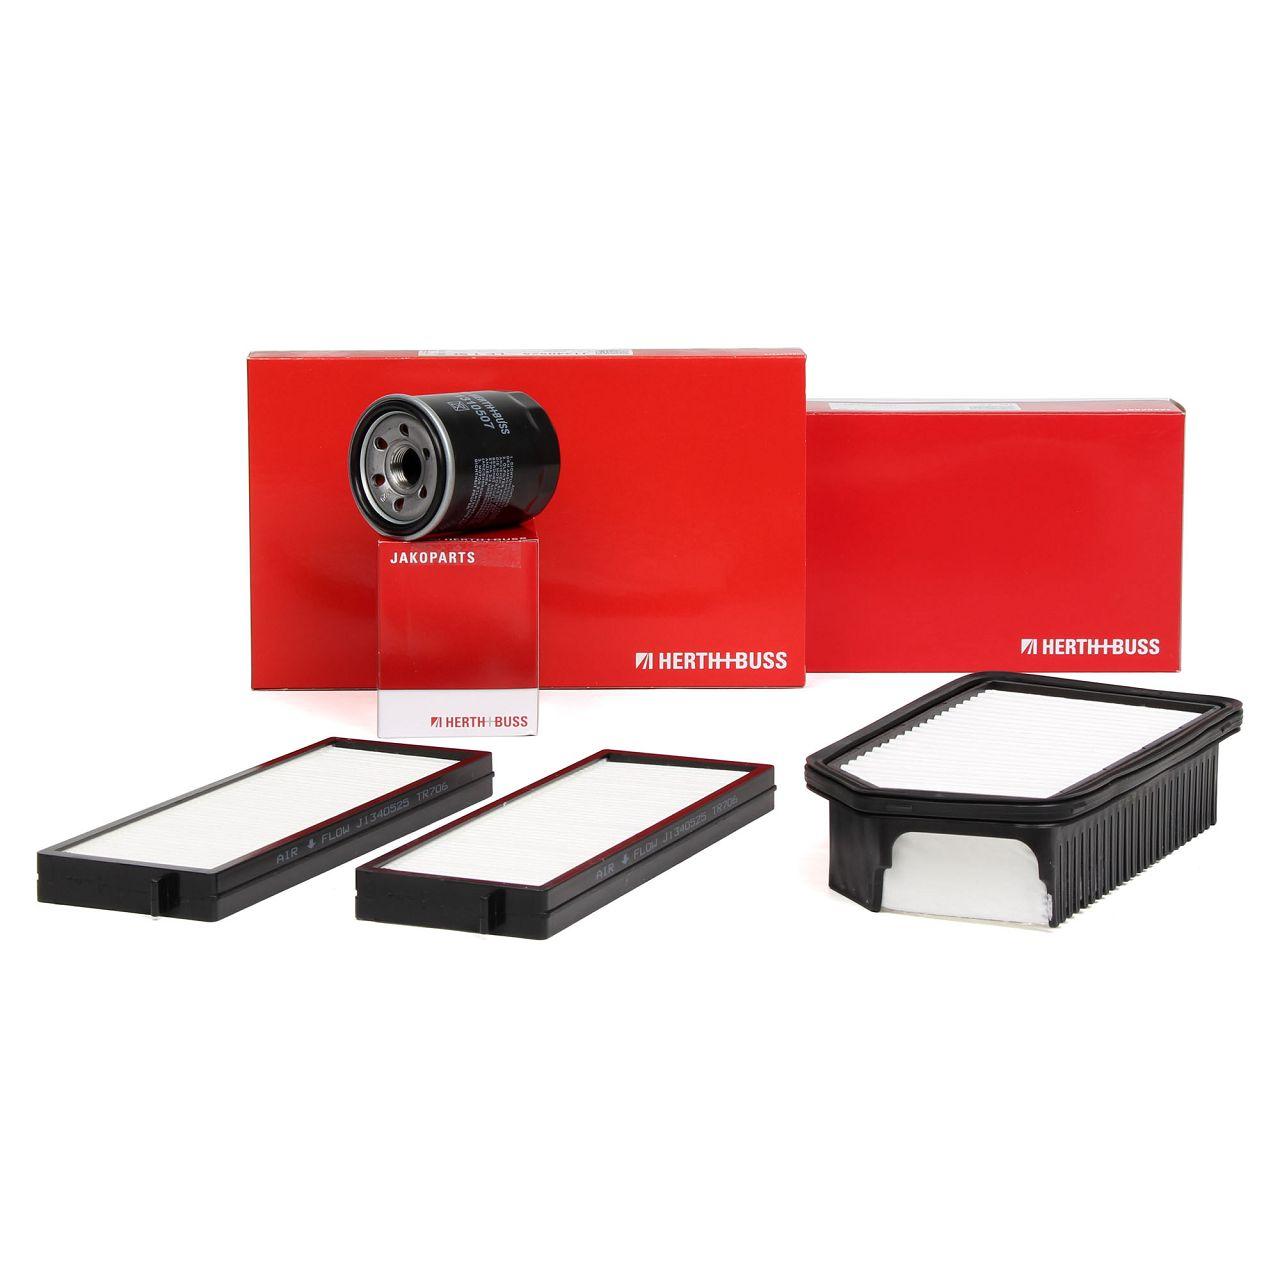 HERTH+BUSS JAKOPARTS Filterpaket Filterset für HYUNDAI i20 (PB PBT) 1.2 78 PS